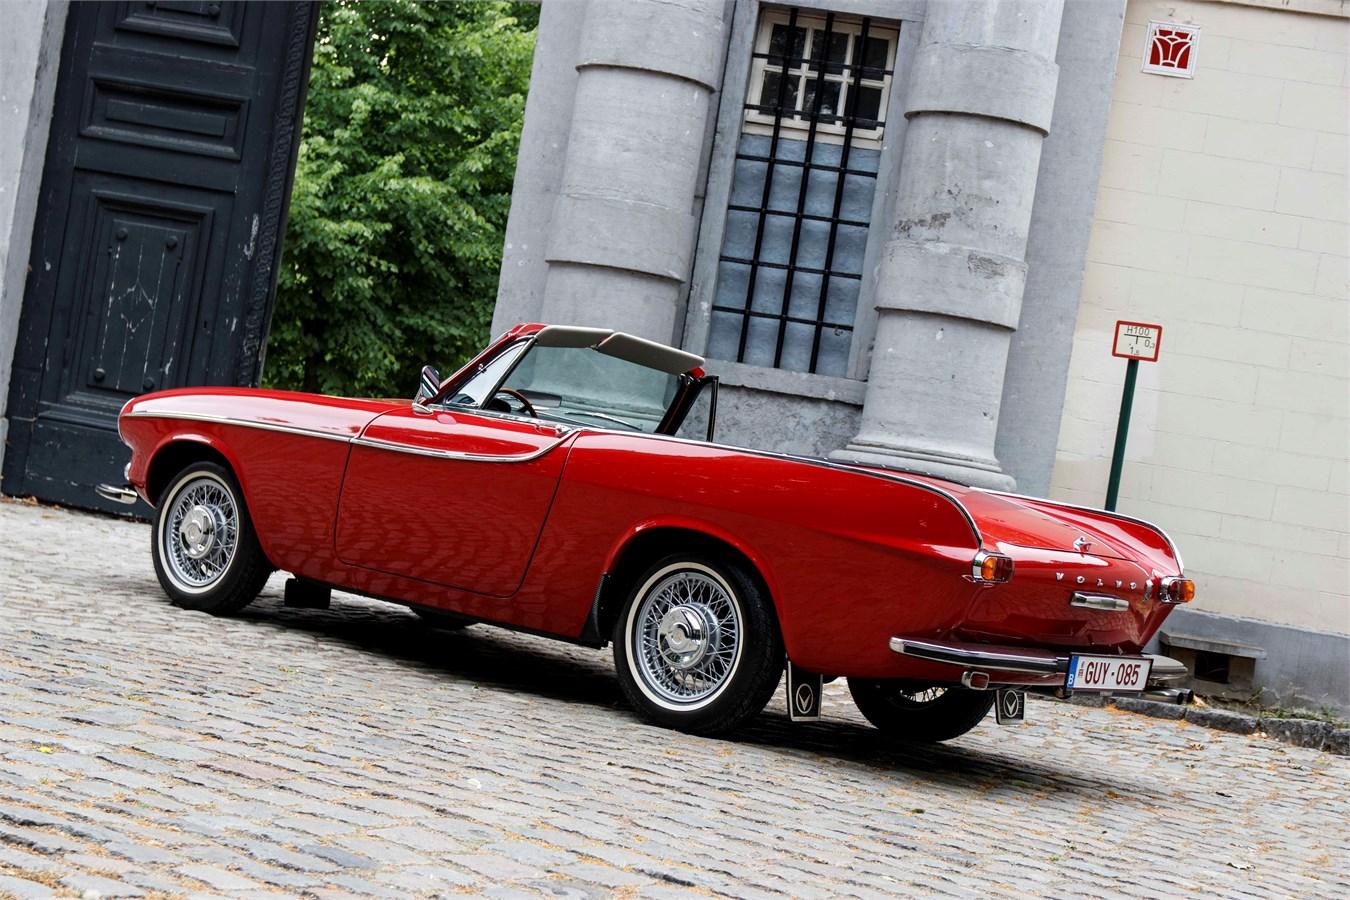 1966 Volvo 1800 S Volvoville Convertible